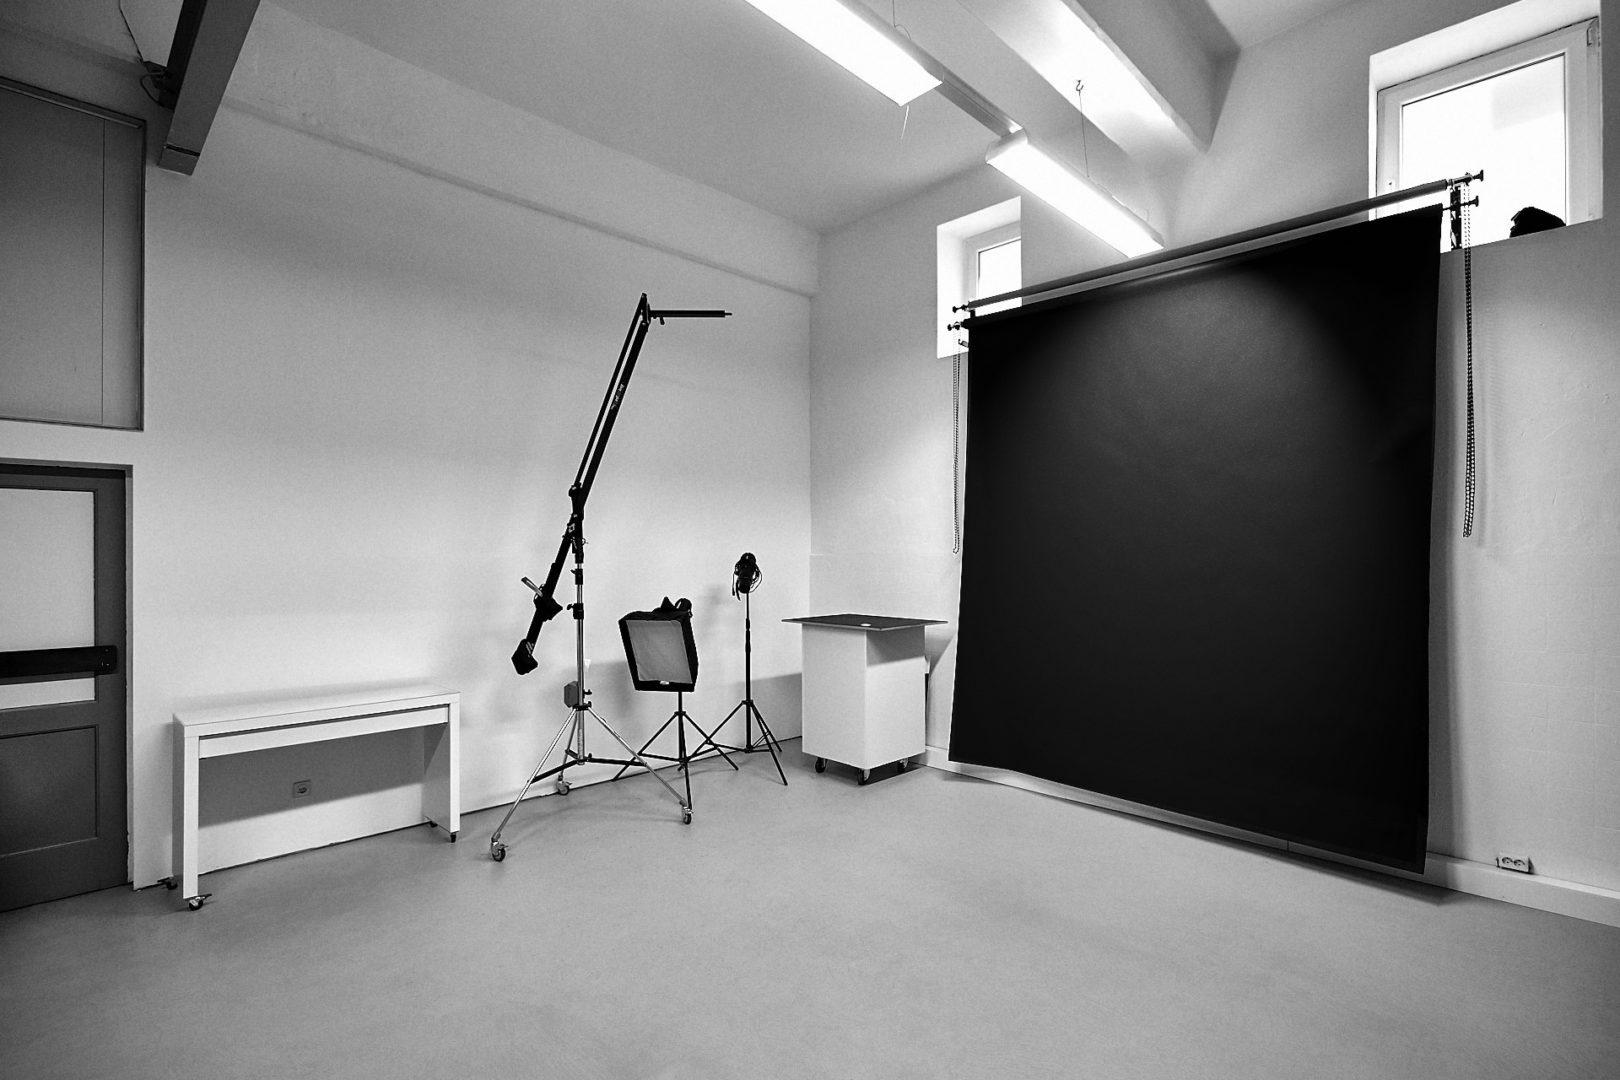 Gegenperspektive Fotostudio und Mietstudio Mielek in Dortmund